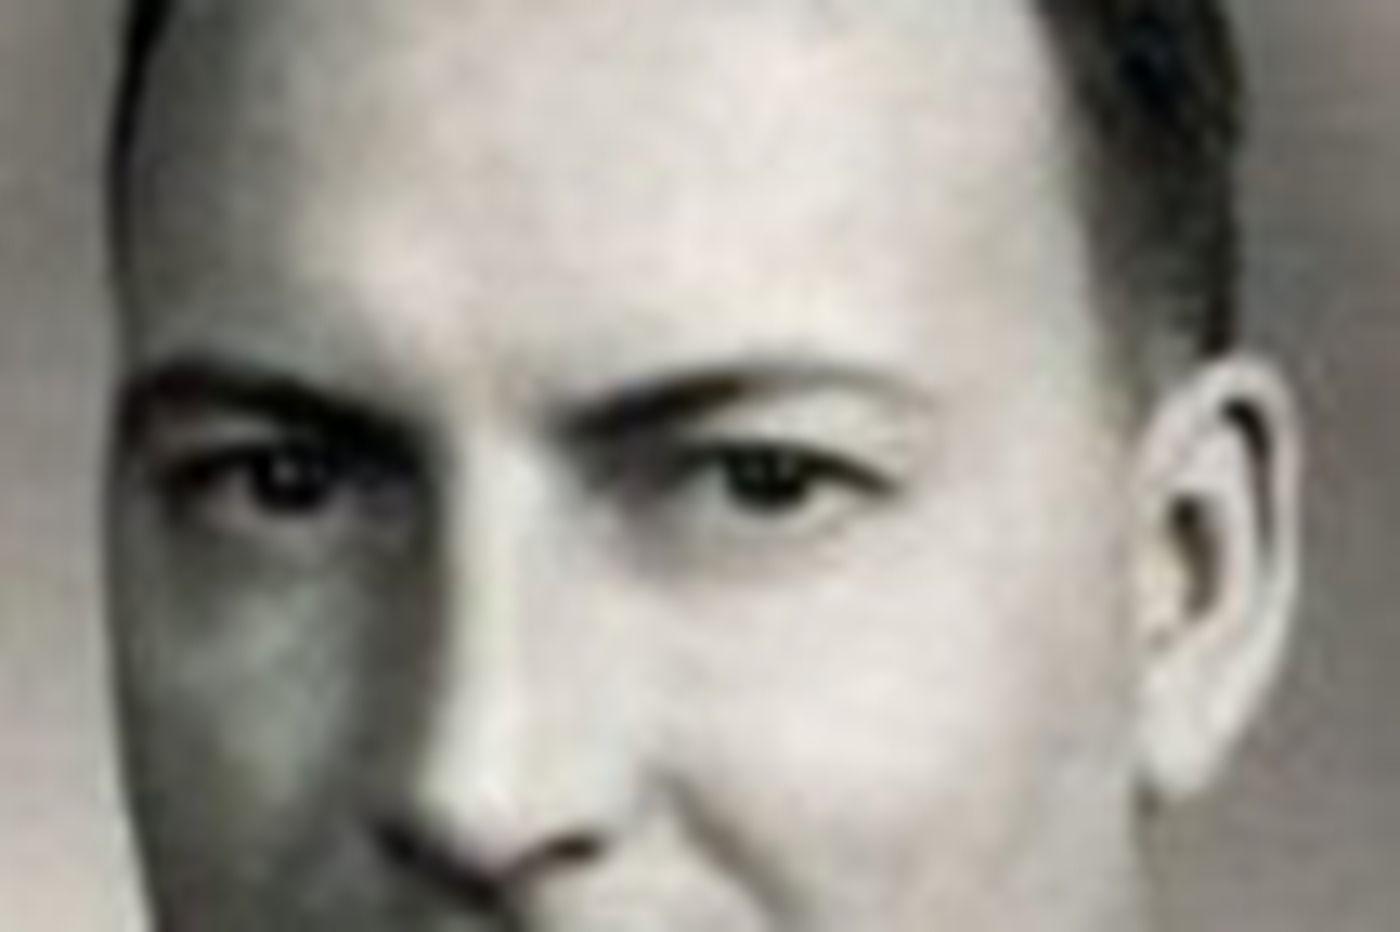 Jesse A. Thomas Jr. | Car-dealership owner, 89